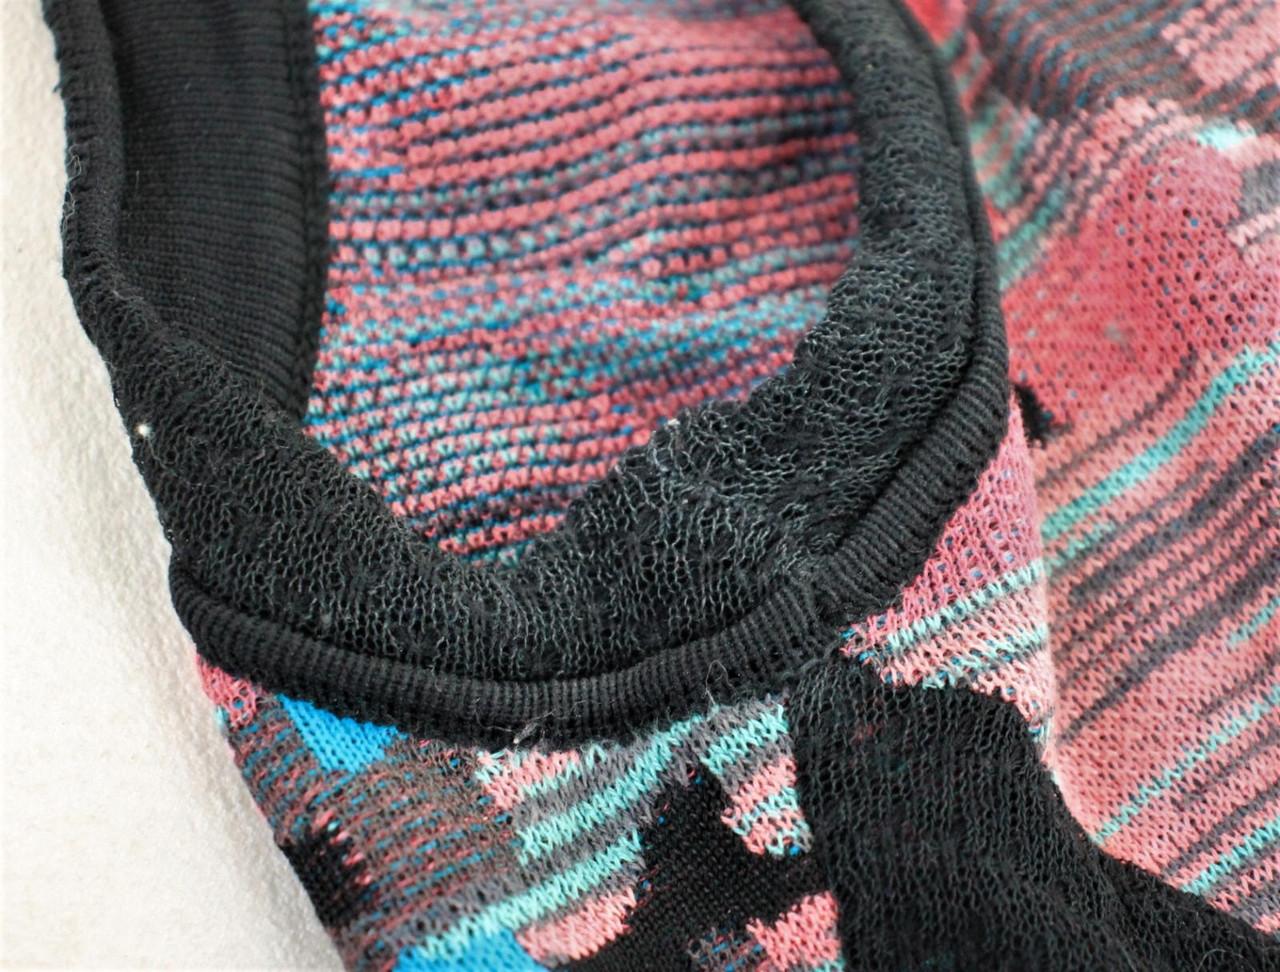 MISSONI Ladies Pink Blue Cotton Blend Net Detail Sleeveless Fit & Flare Dress S